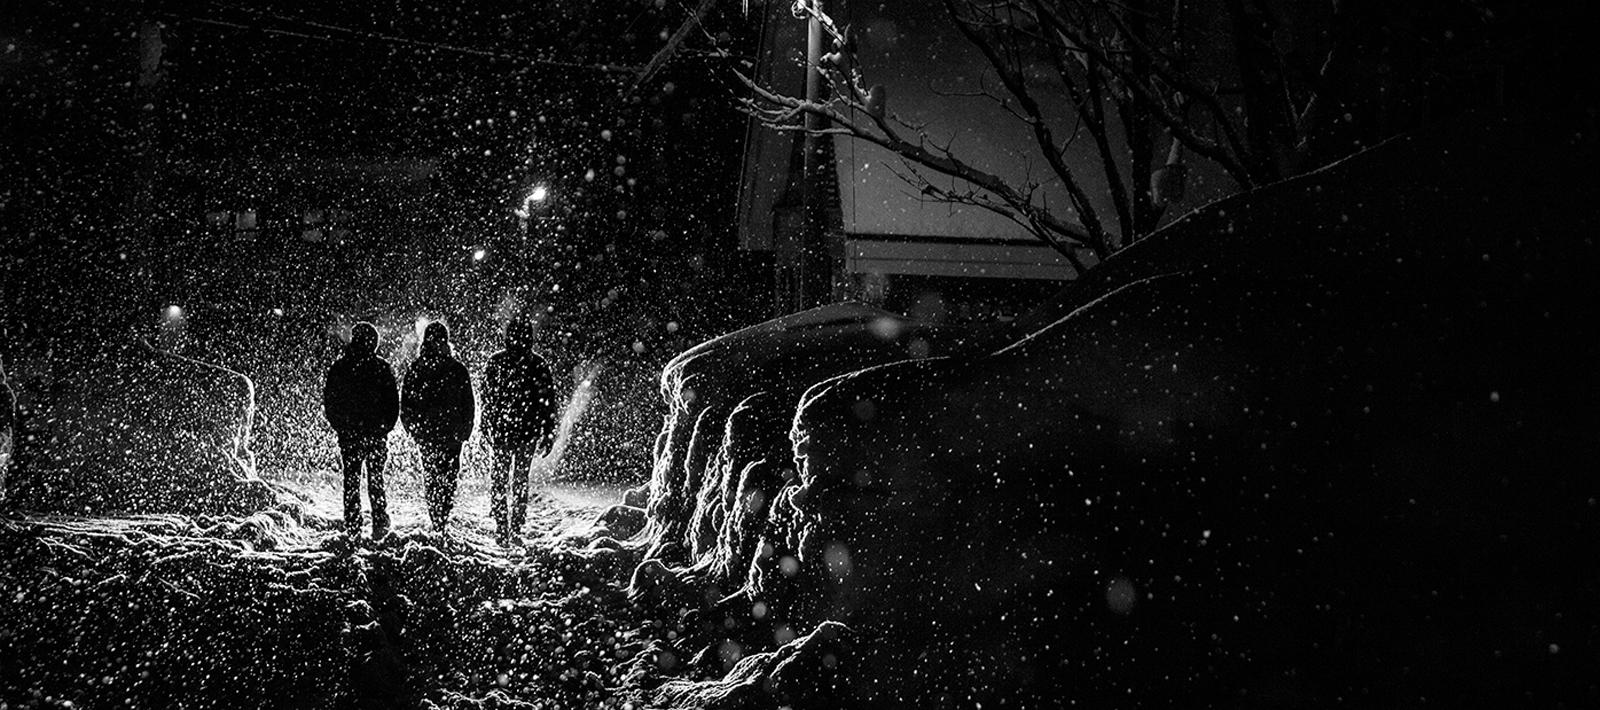 Photo by Oskar Enander